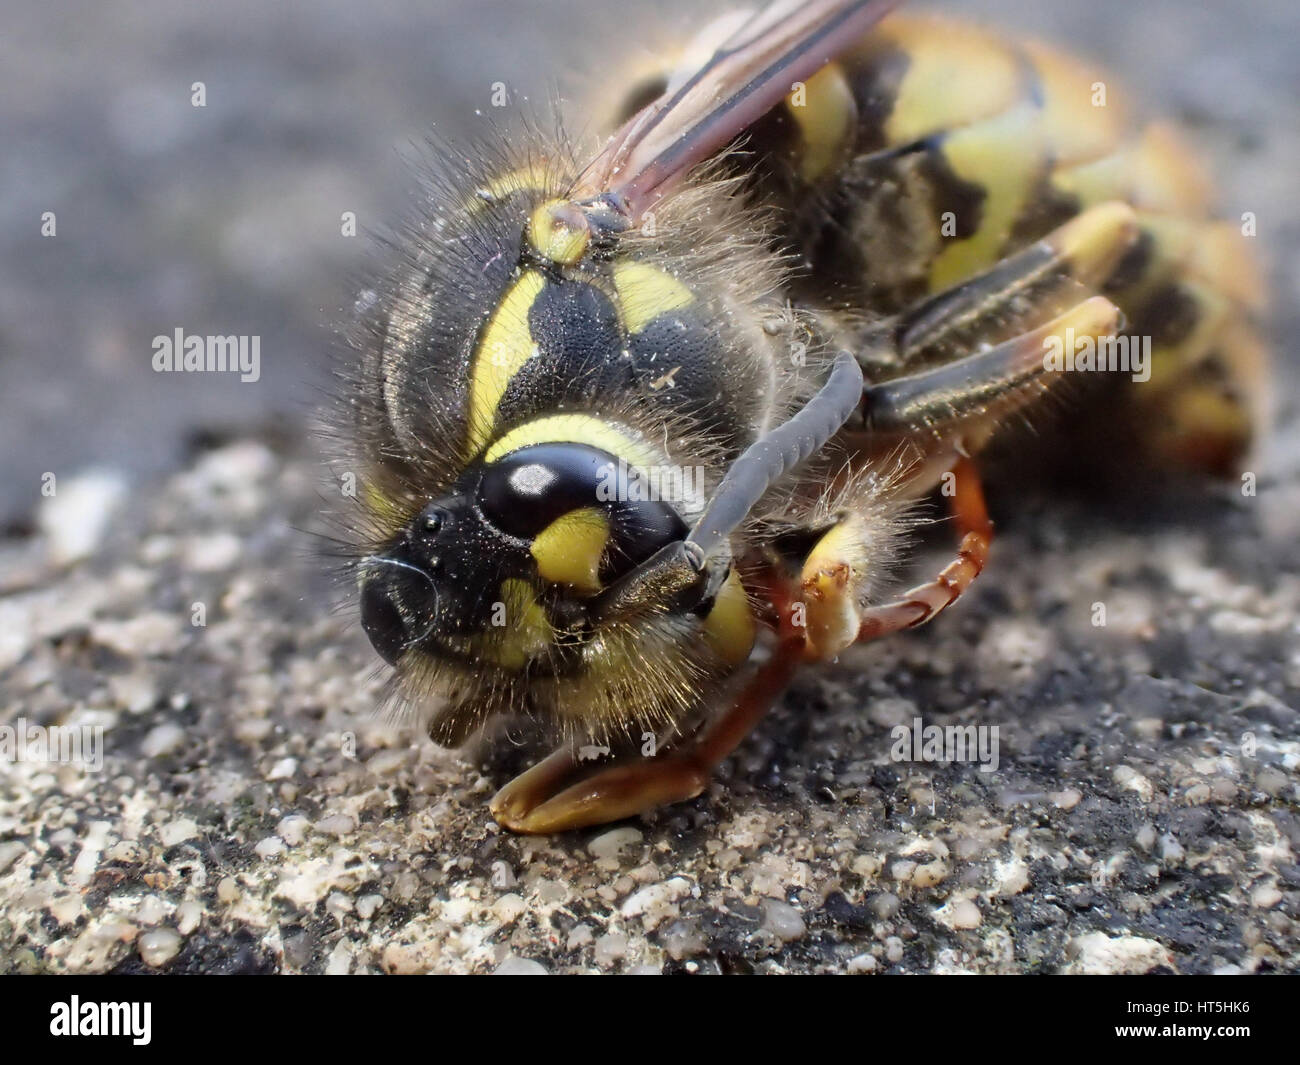 Macro shot three-quarter view of dead European wasp (Vespula vulgaris) lying on a limestone paving slab - Stock Image